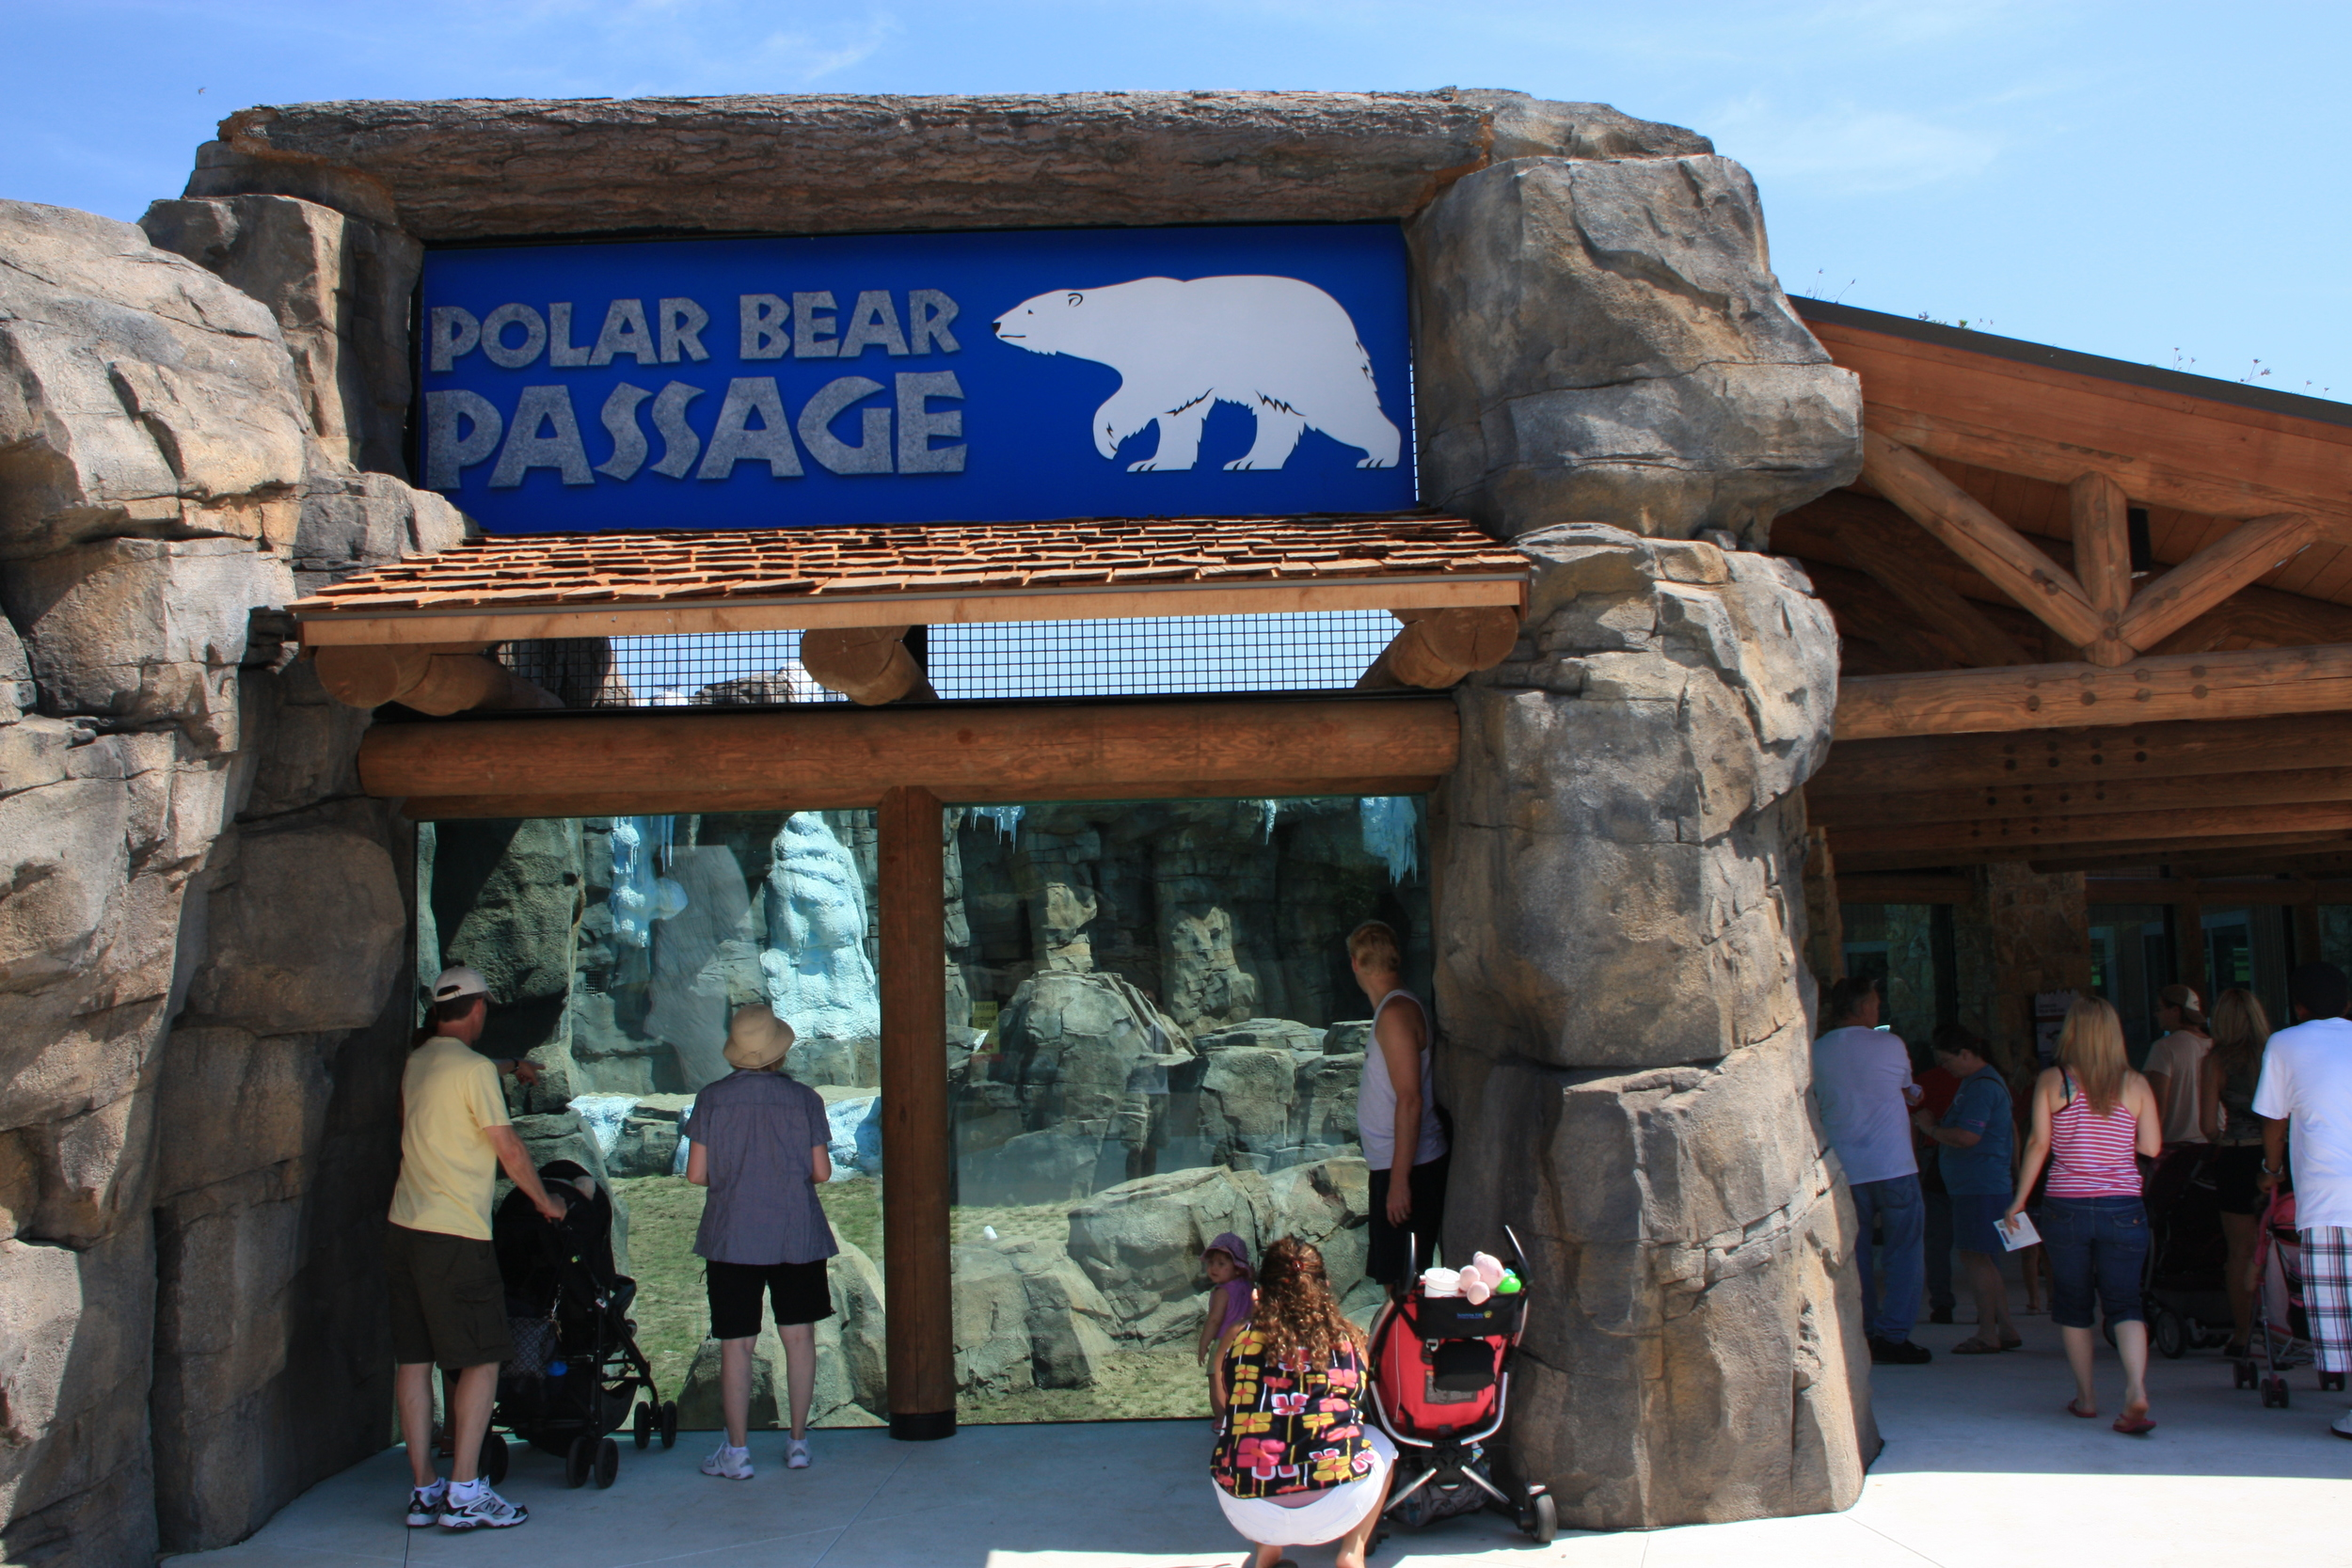 Polar Bear Passage.JPG